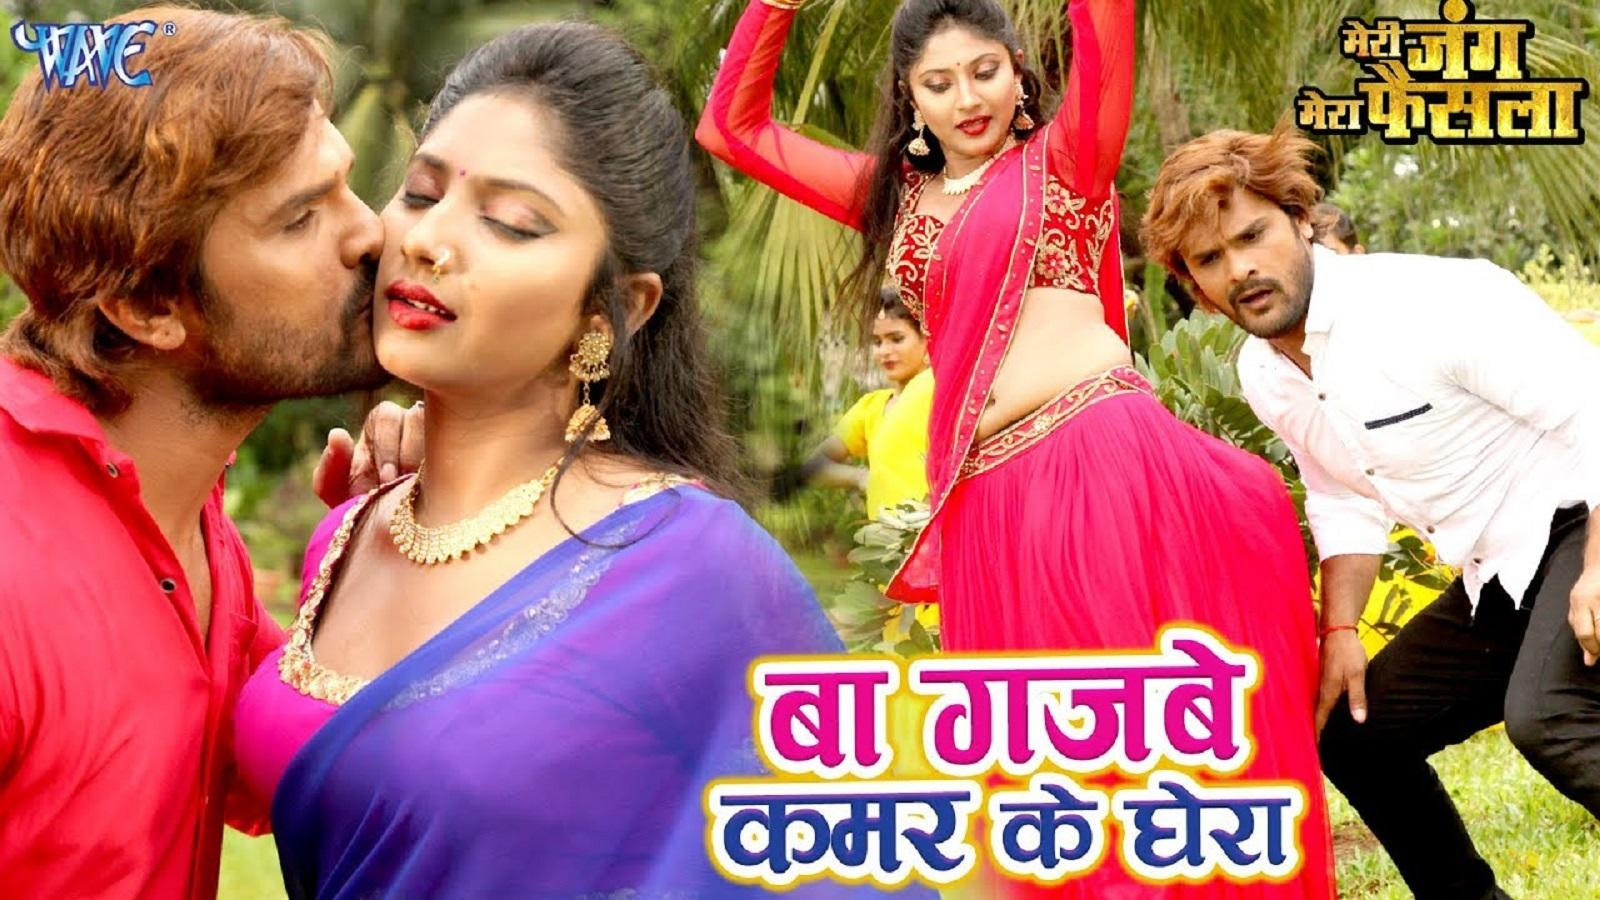 Khesari Lal Yadav Bhojpuri Song Videos 2019: Bhojpuri Gana Video Song 'Ba  Gajbe Kamar Ke Ghera' Ft. Khesari Lal Yadav and Moon Moon Ghosh